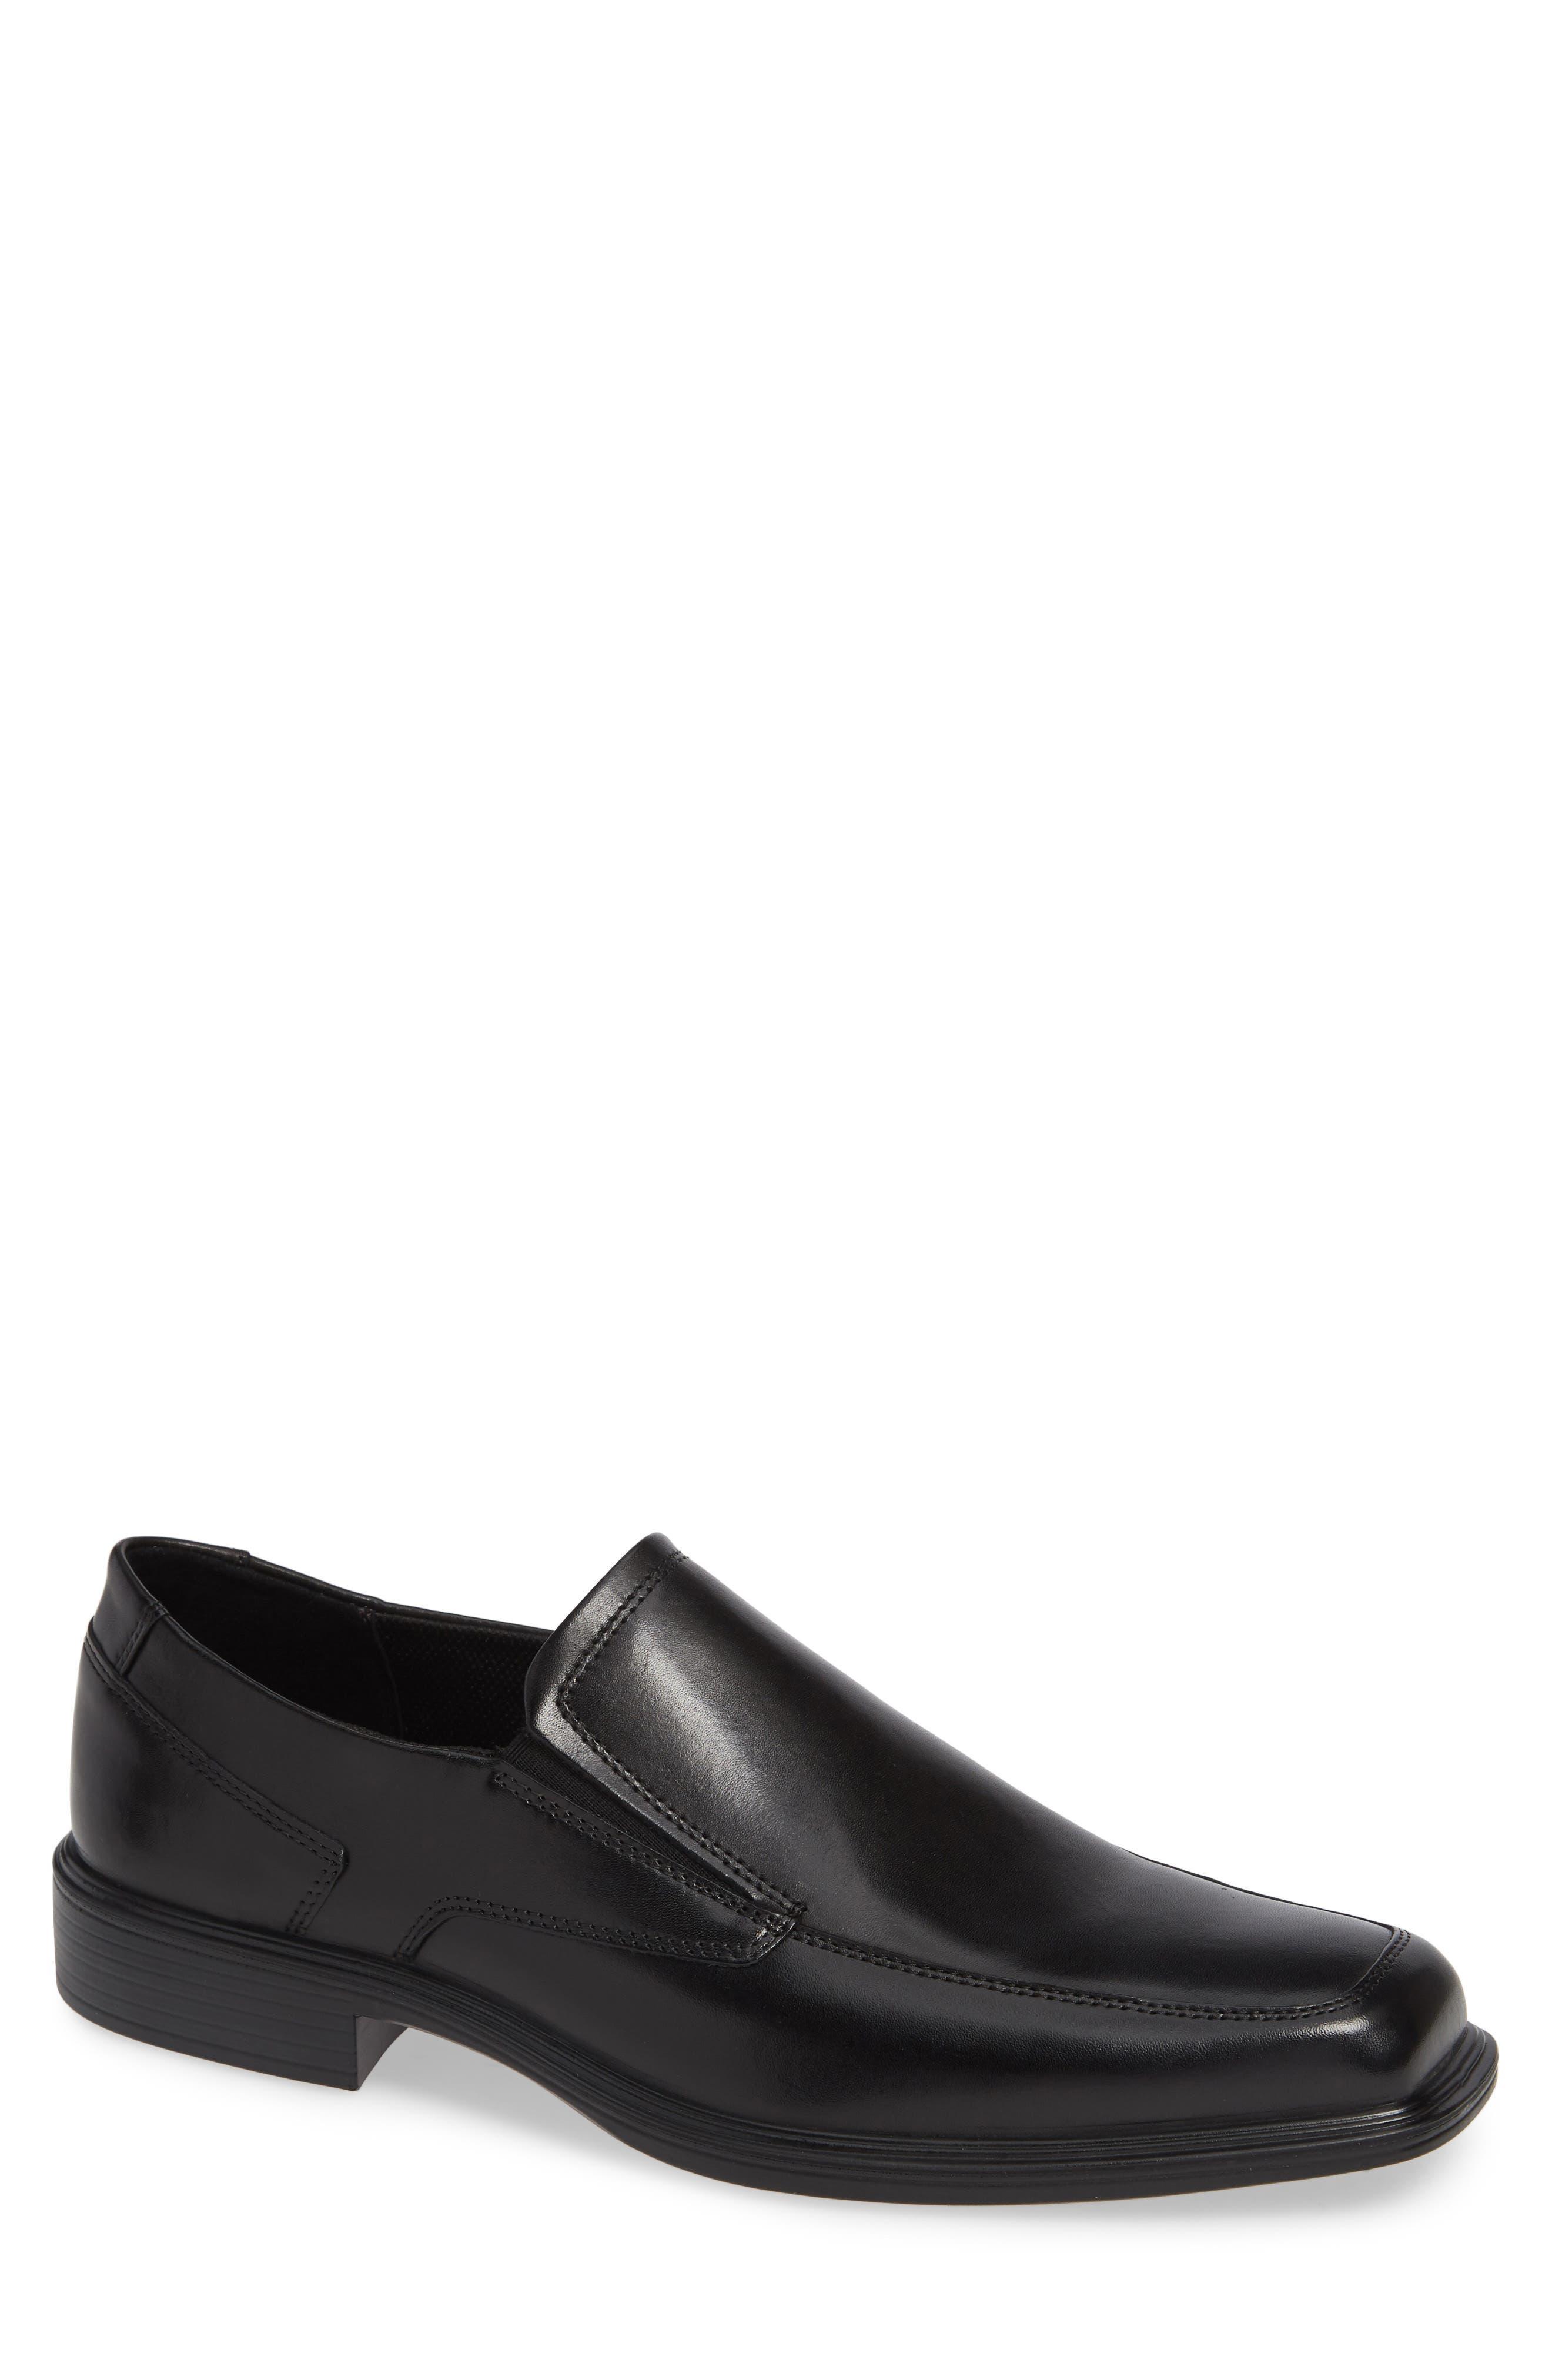 ECCO Minneapolis Venetian Loafer, Main, color, BLACK/BLACK LEATHER